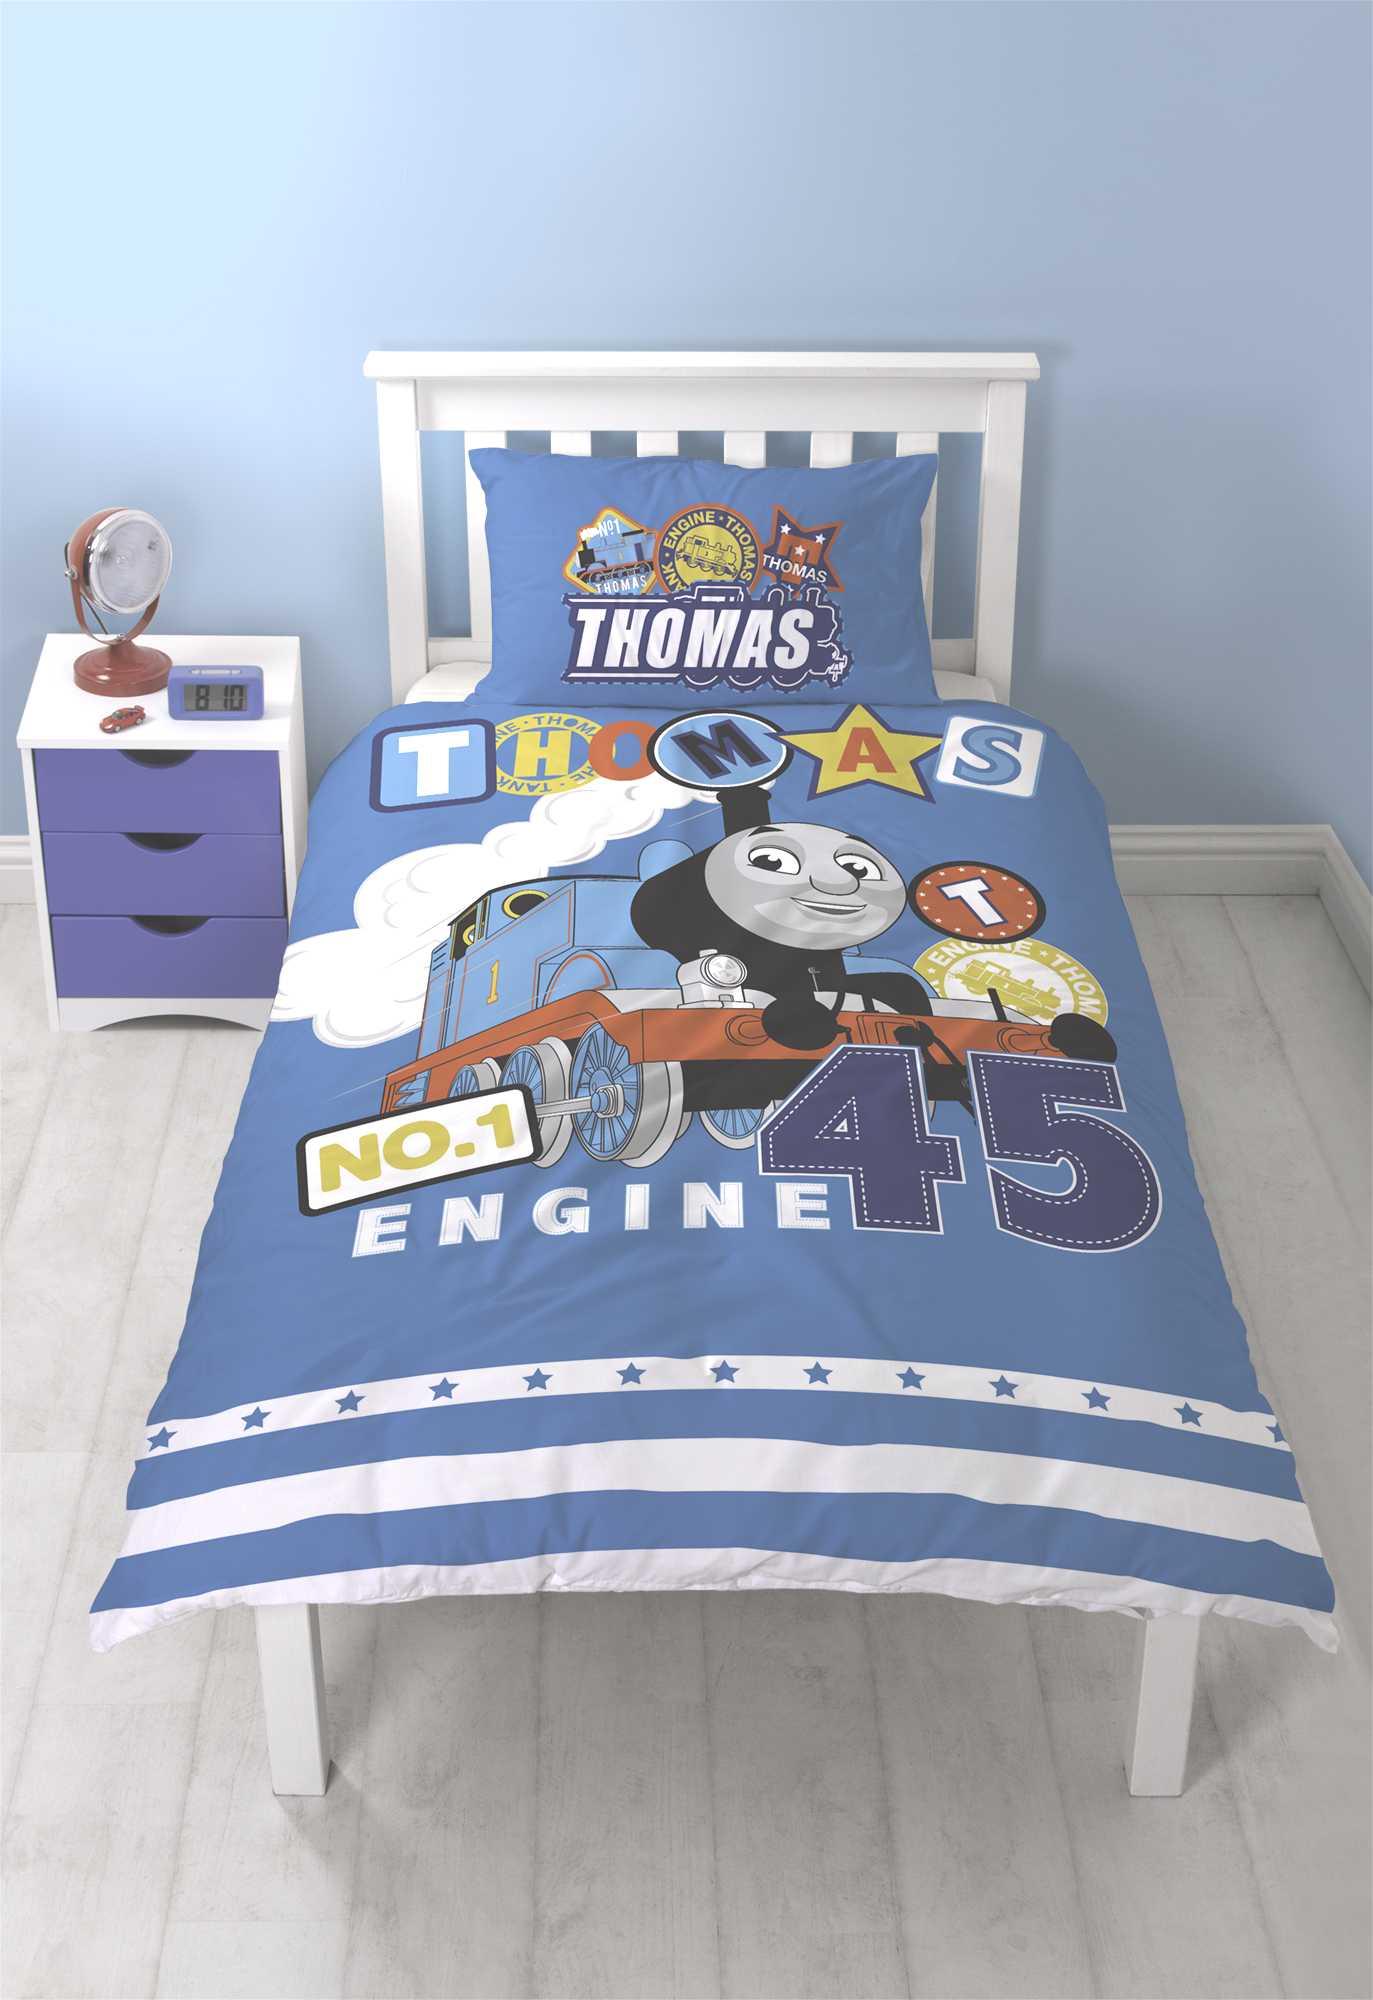 OFFICIAL THOMAS THE TANK ENGINE SINGLE DUVET QUILT COVER SET BOYS ... : thomas single bed quilt cover - Adamdwight.com